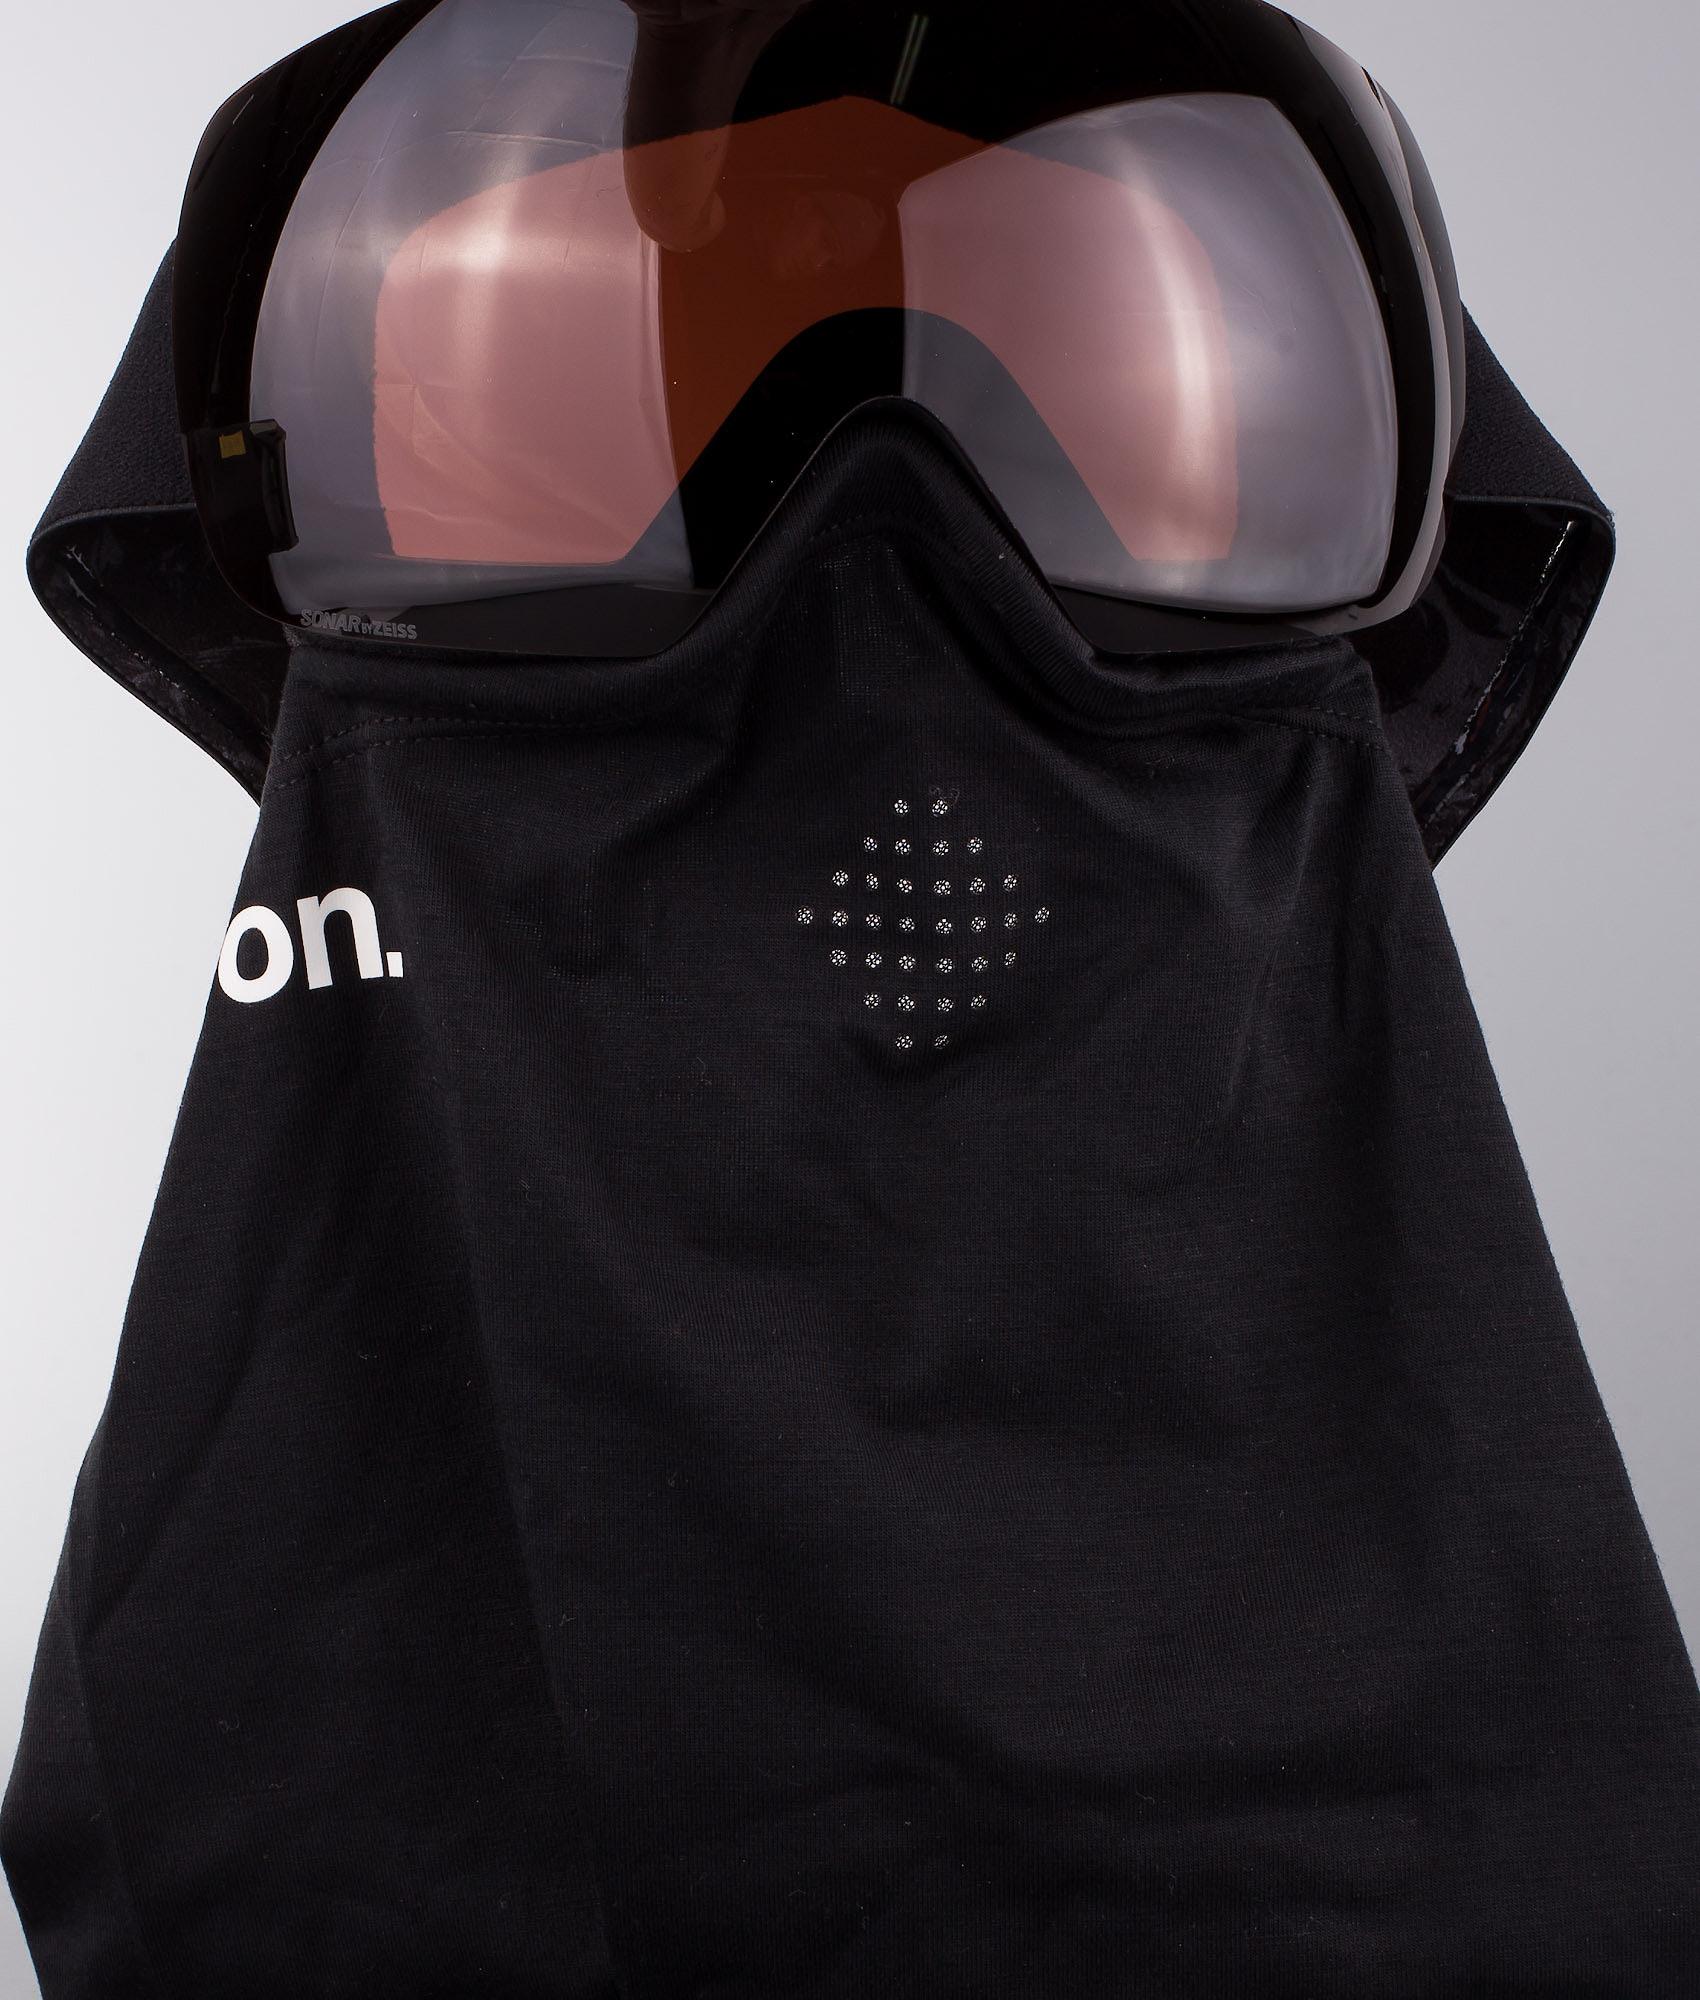 368c68d0601 Anon Mig Mfi Ski Goggle Smoke Sonarsmoke - Ridestore.com